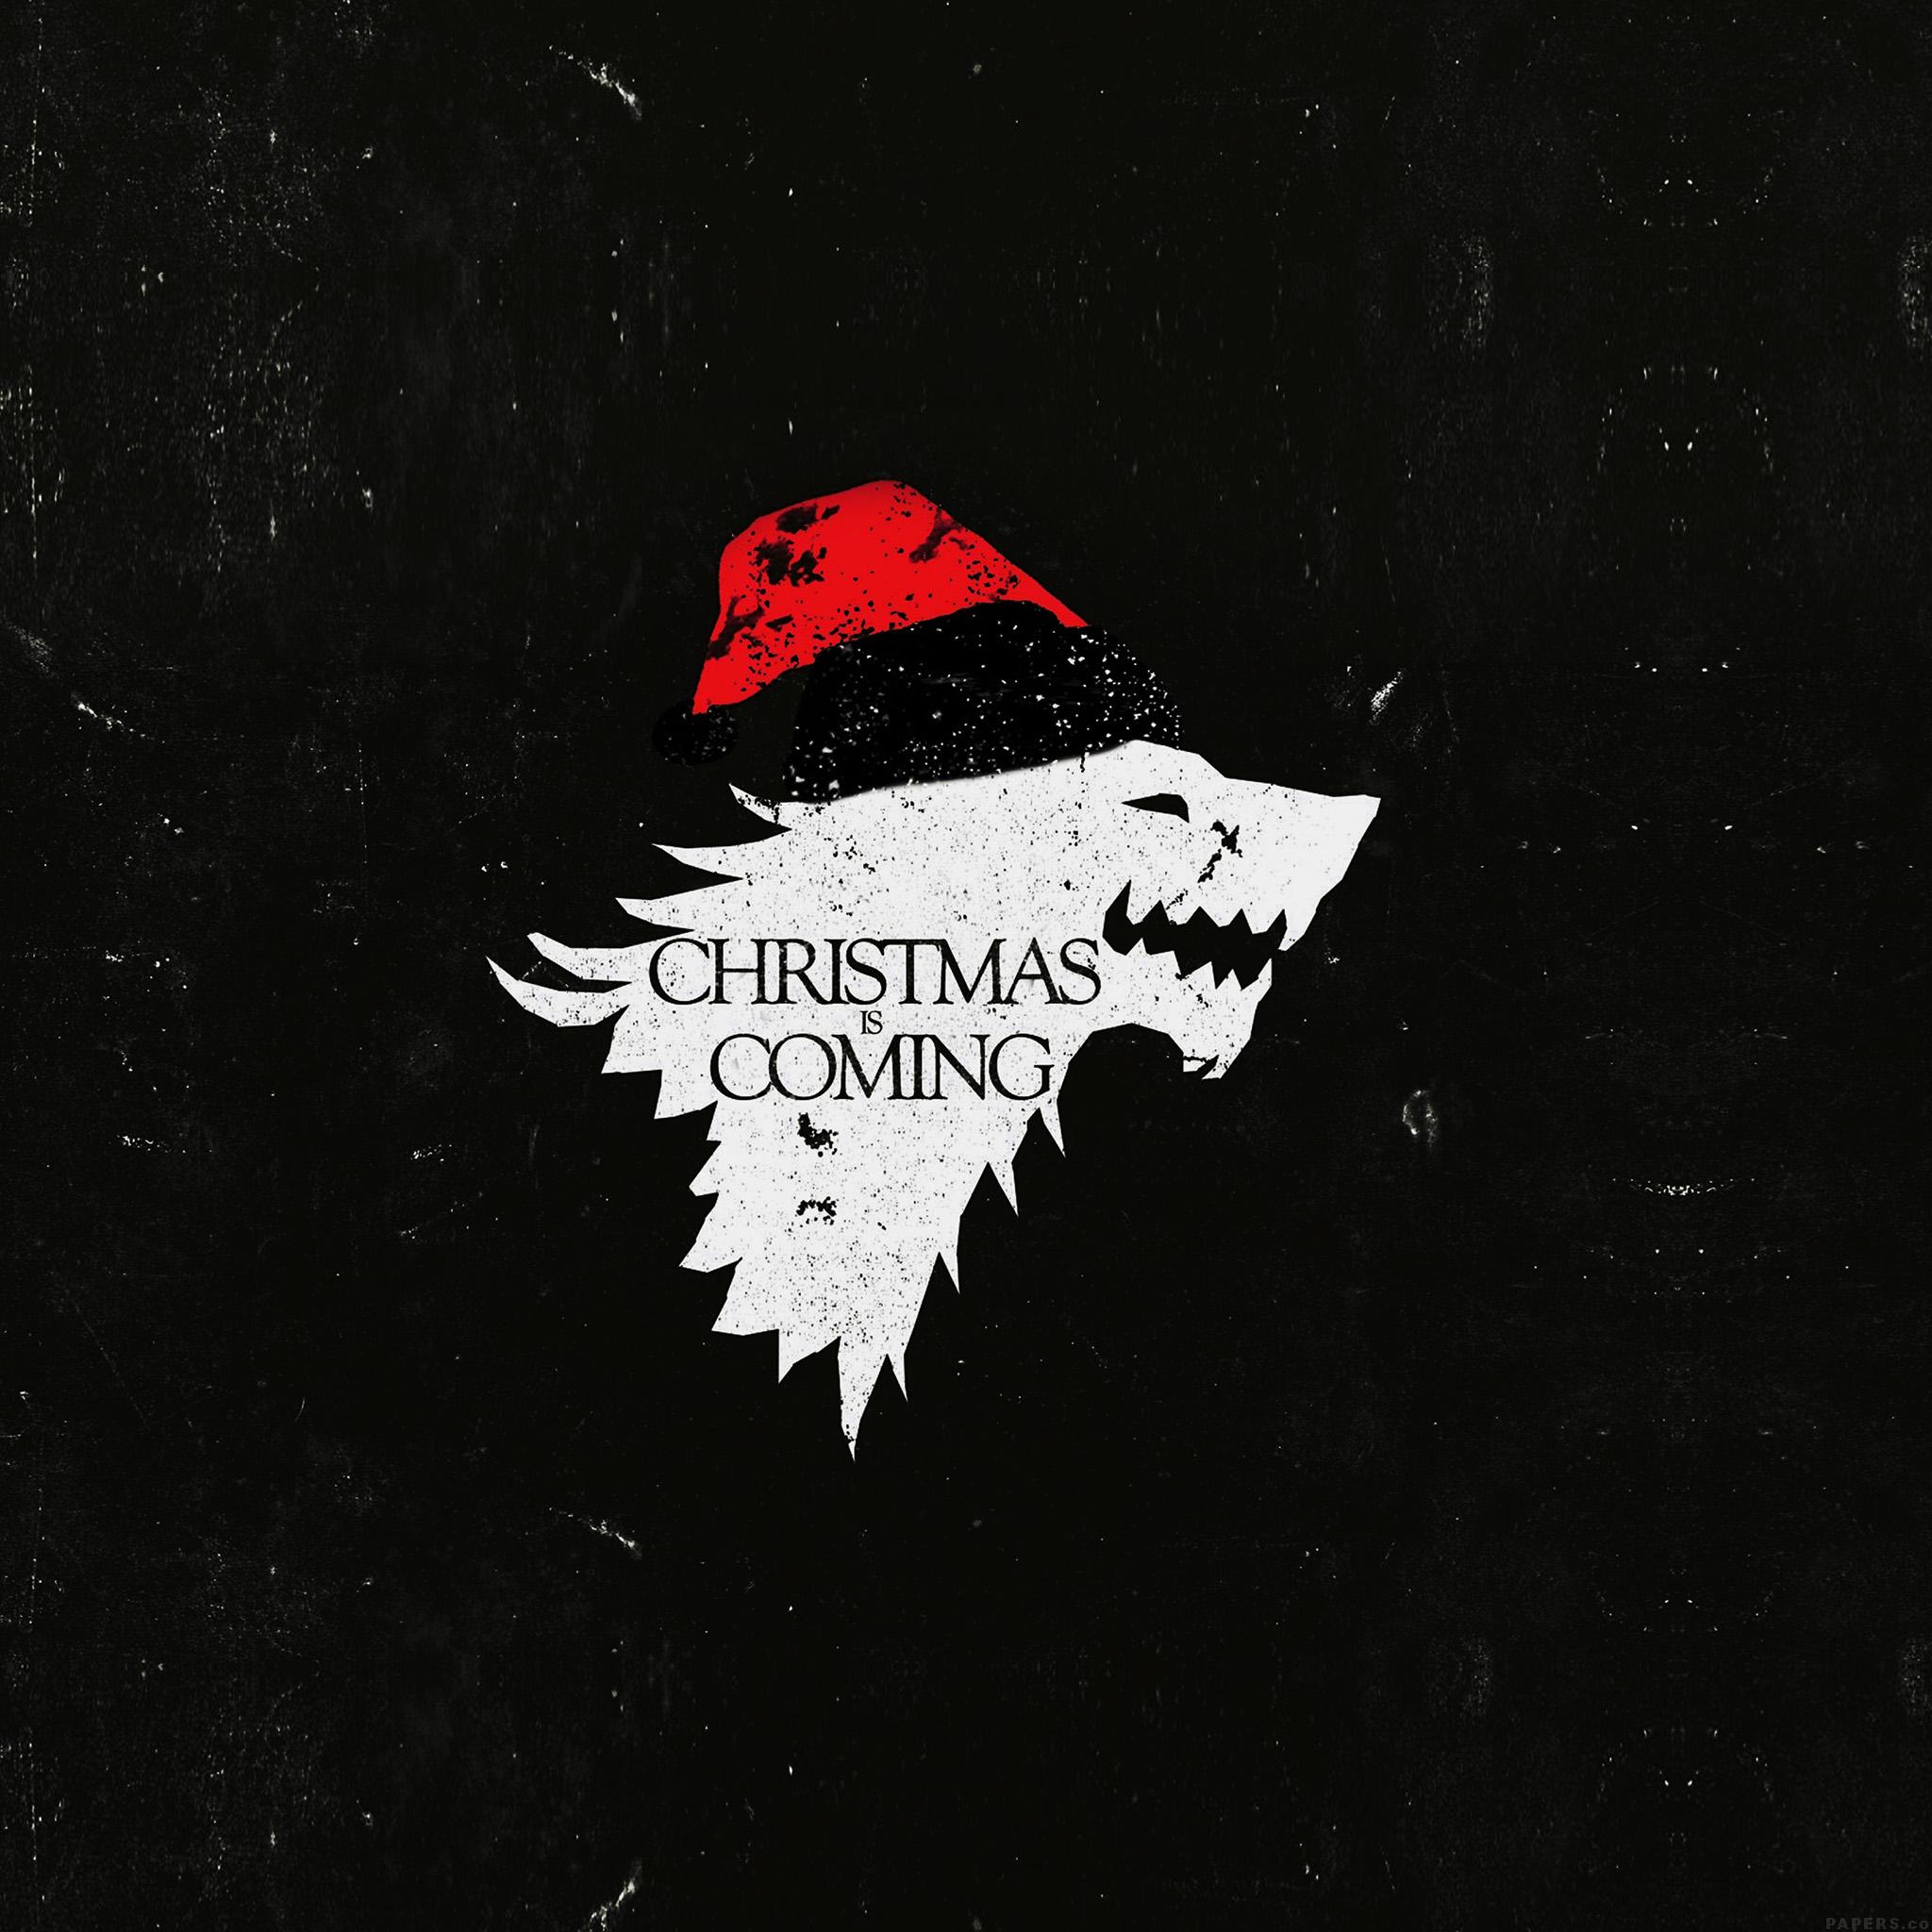 Xmas Wallpaper Iphone Ag24 Christmas Is Coming Dark Game Of Thrones Art Wallpaper